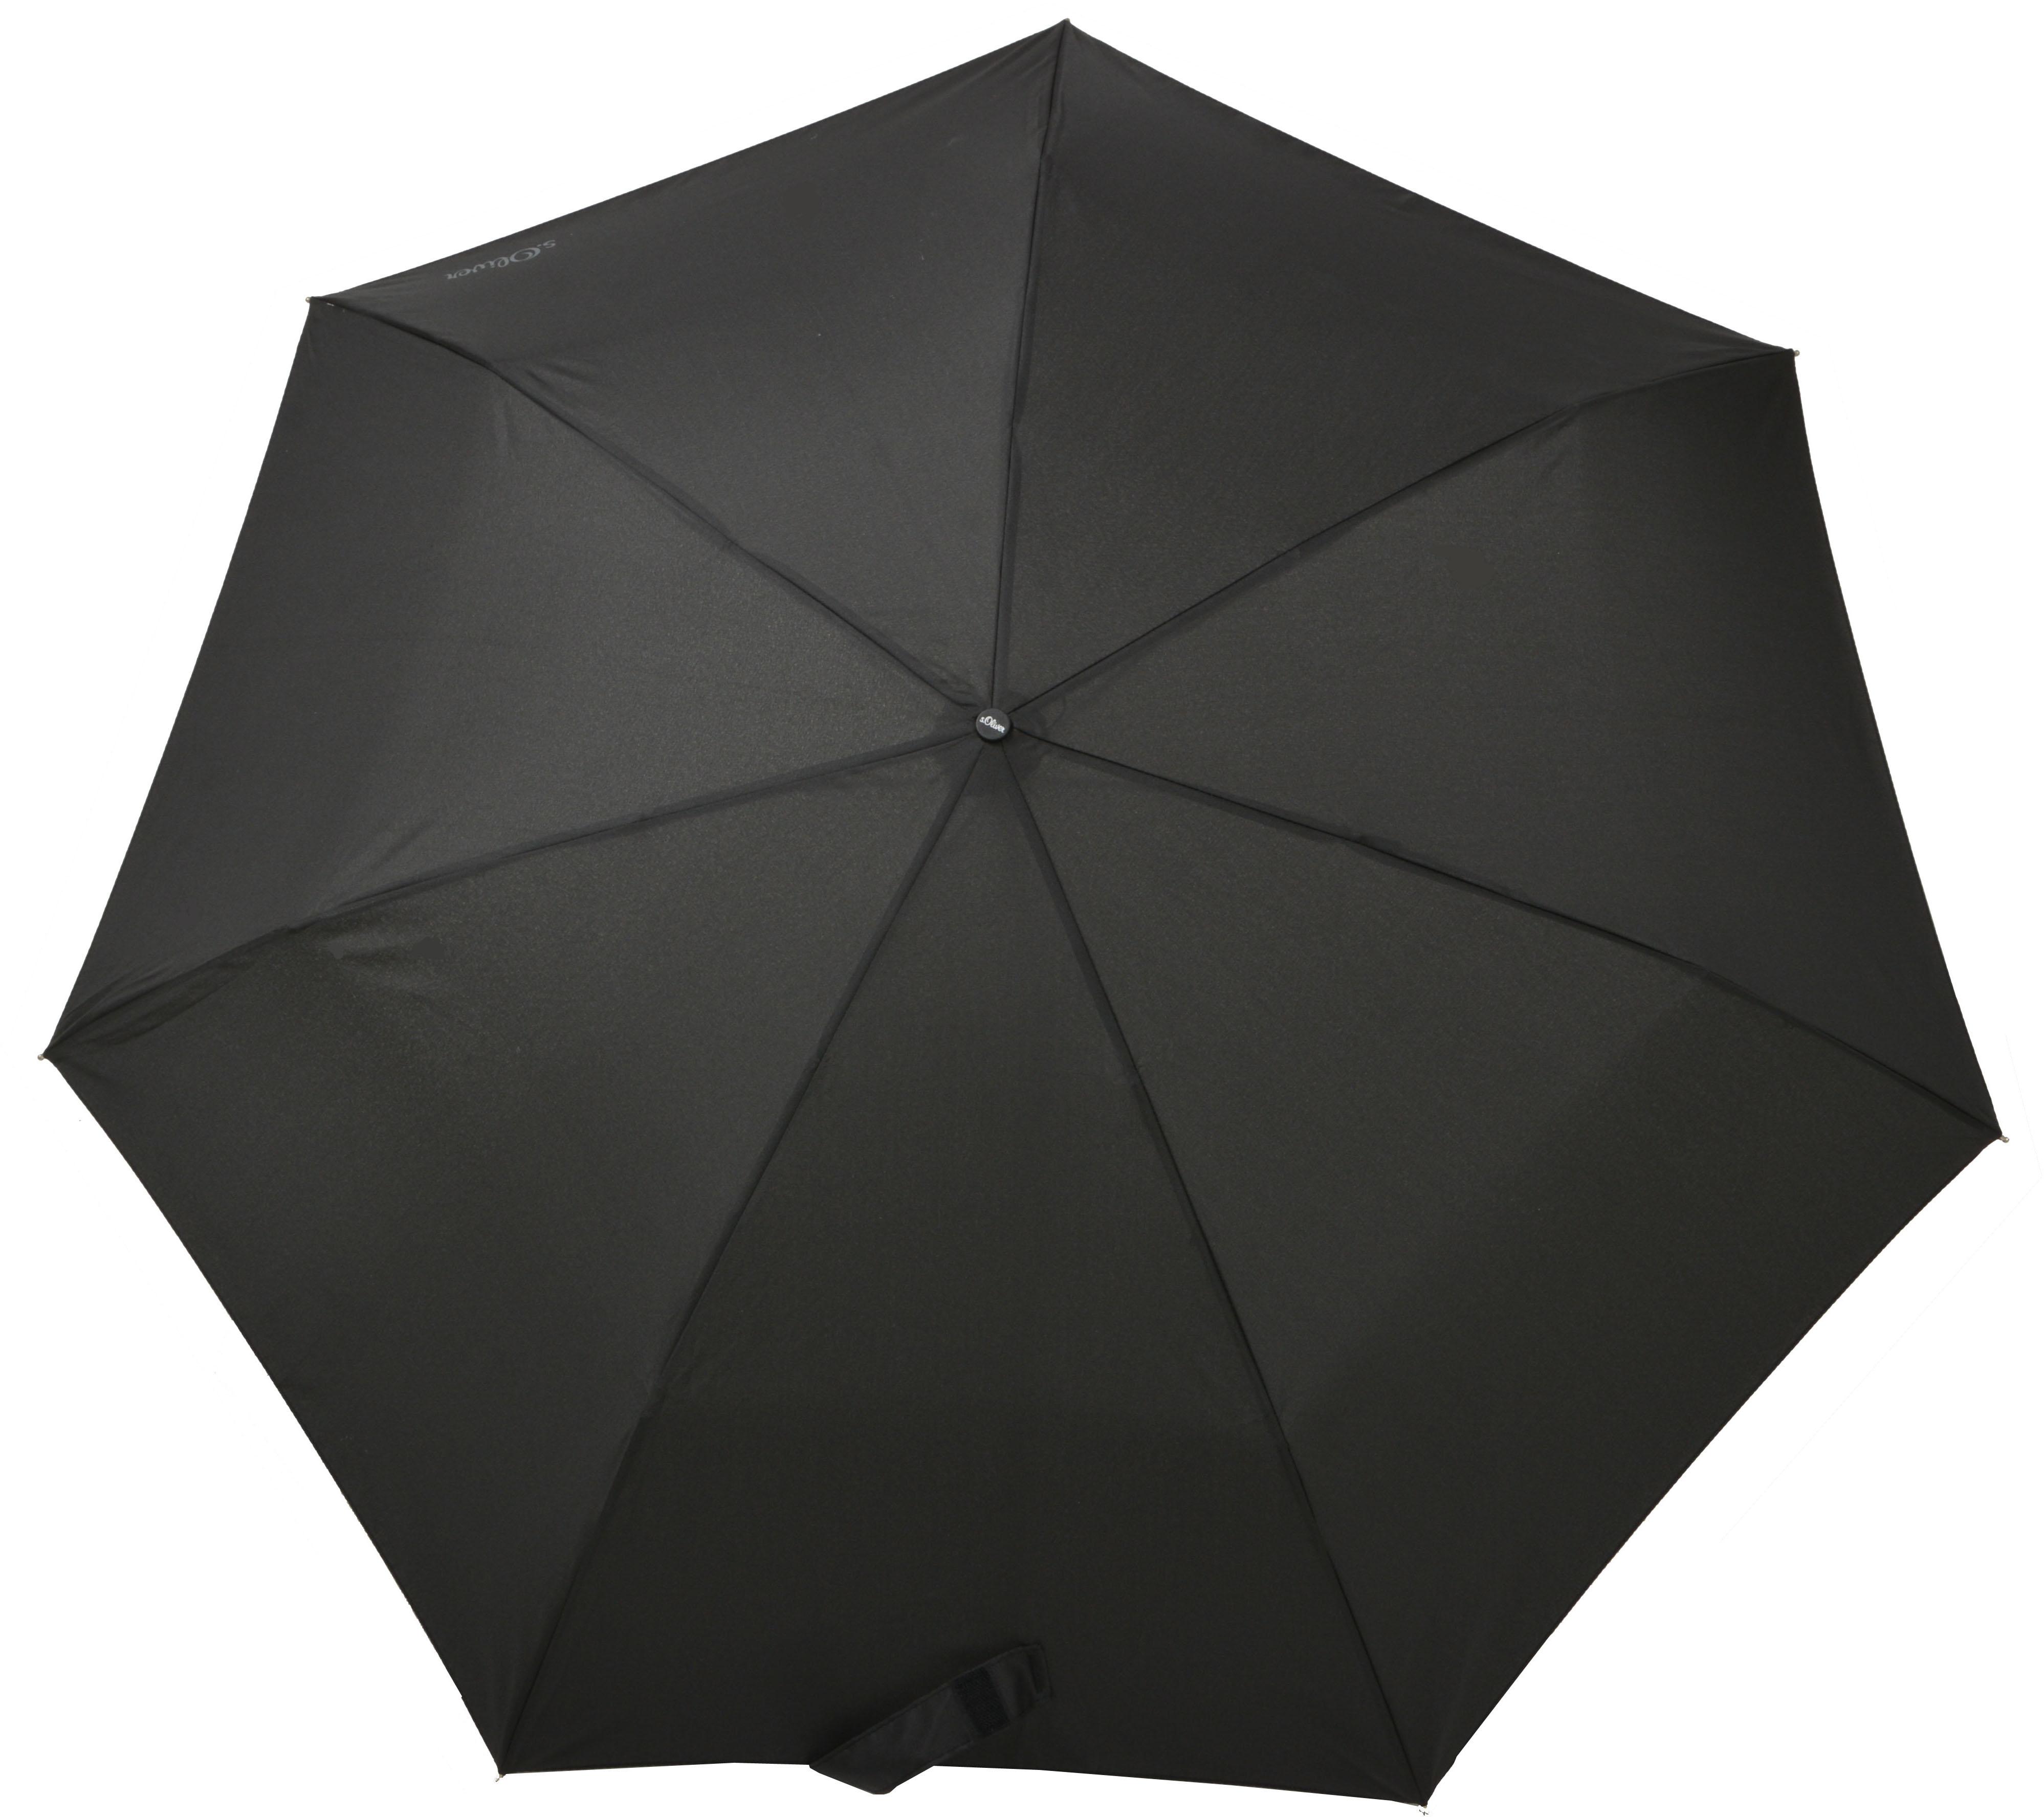 sOliver Taschenregenschirm ´´Duopop´´   Accessoires > Regenschirme > Sonstige Regenschirme   Schwarz   Polyester   S.Oliver